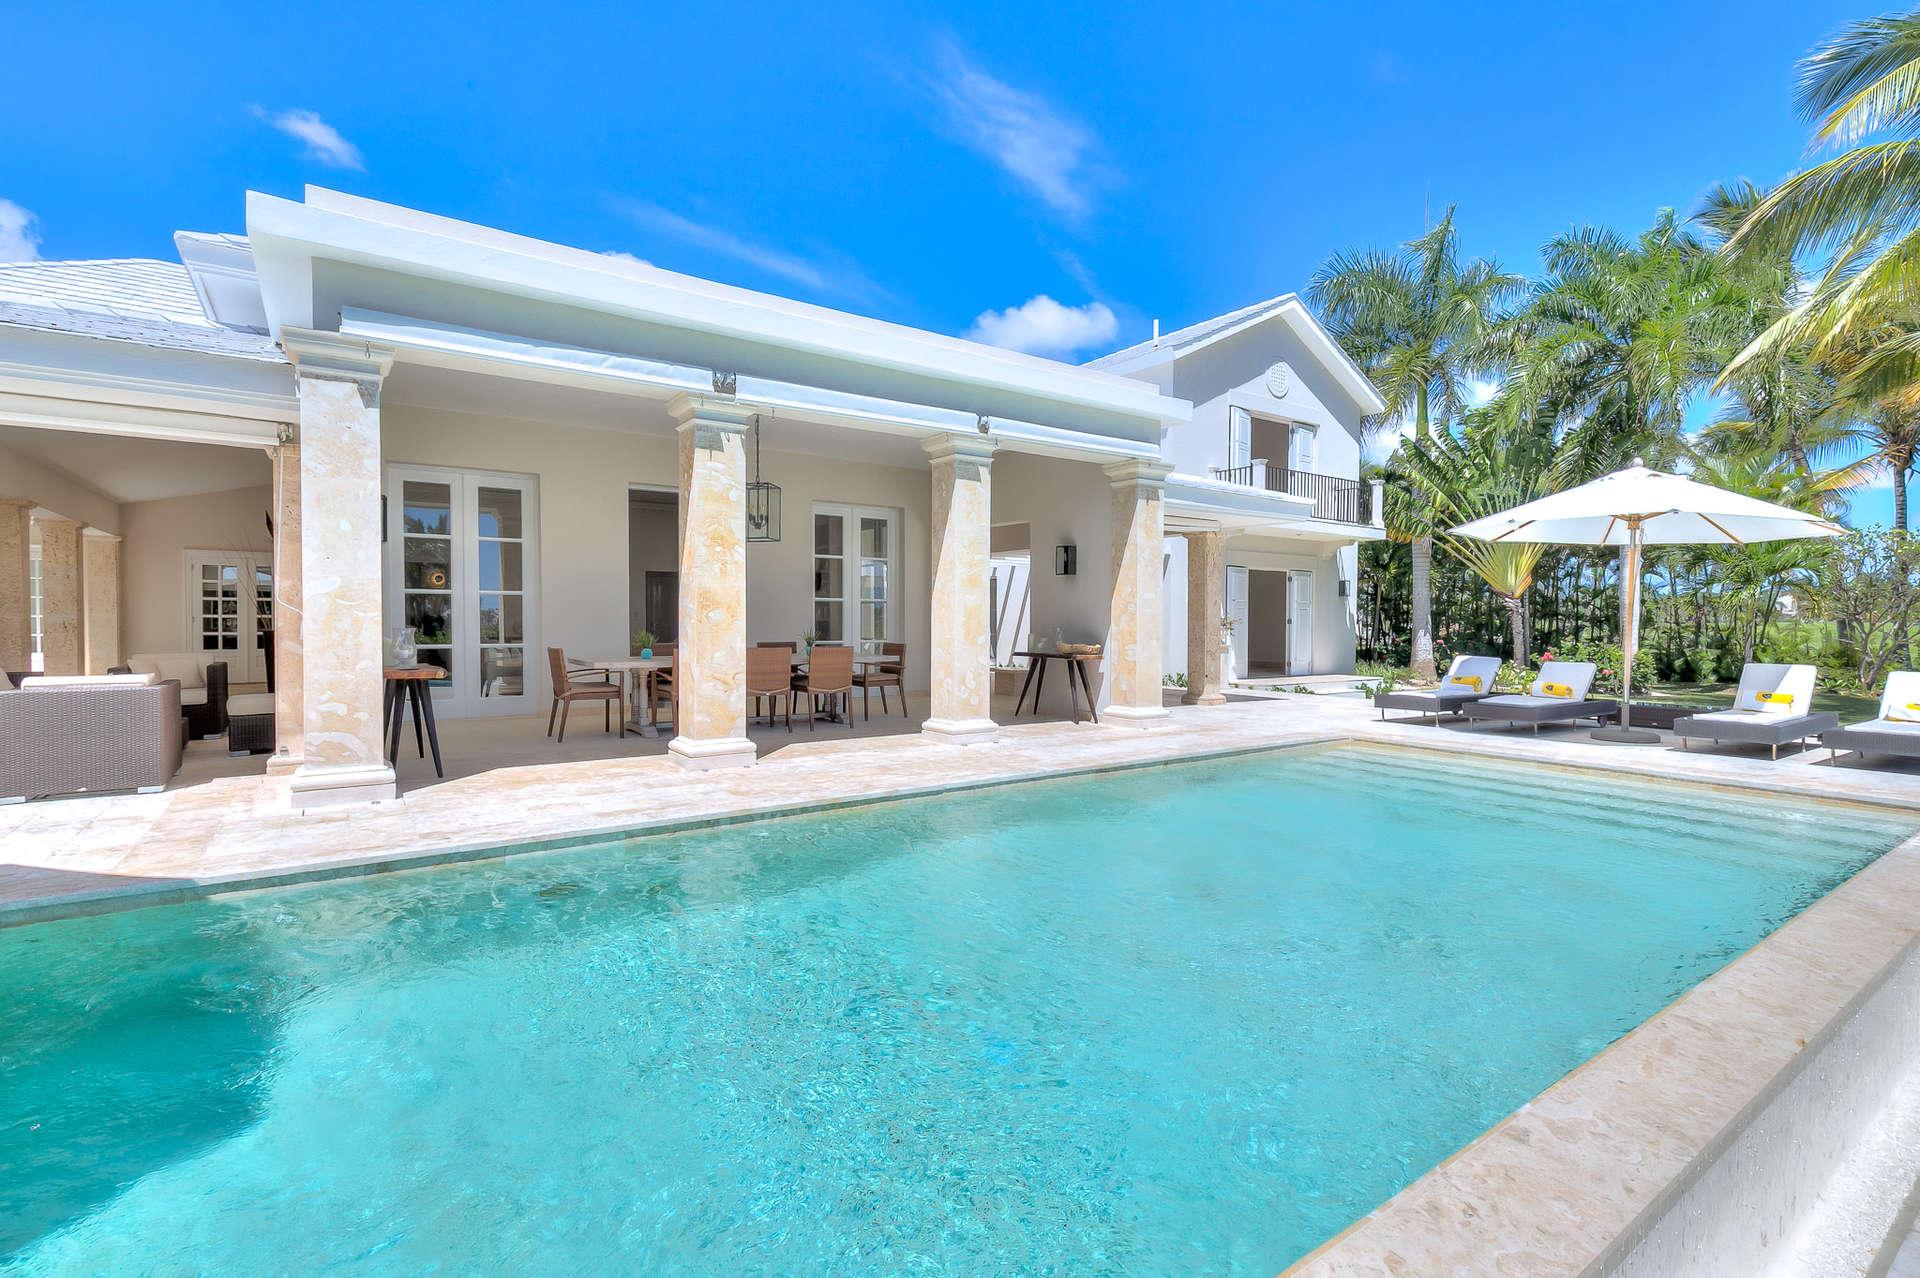 Luxury villa rentals caribbean - Dominican republic - Punta cana - Punta cana resort and club - Tortuga B28 - Image 1/20